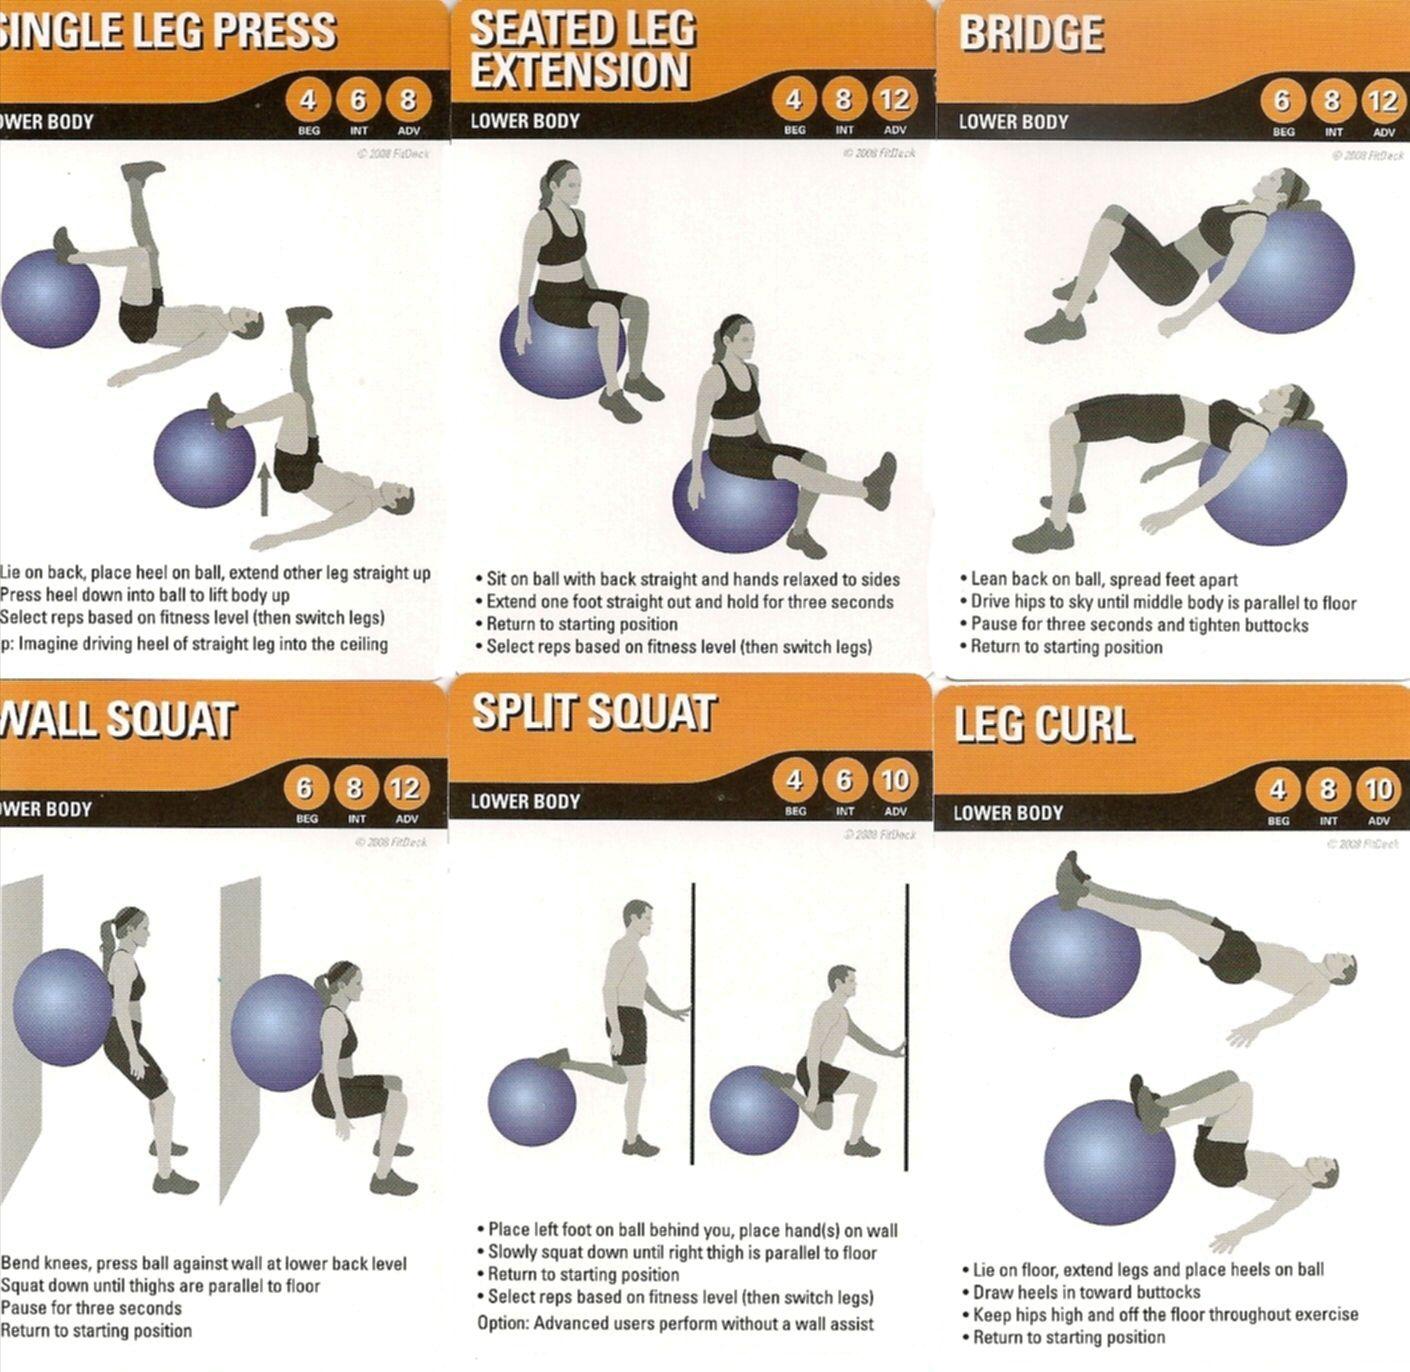 Bosu Ball Uk Stockists: Lower Body Stability Ball Exercises